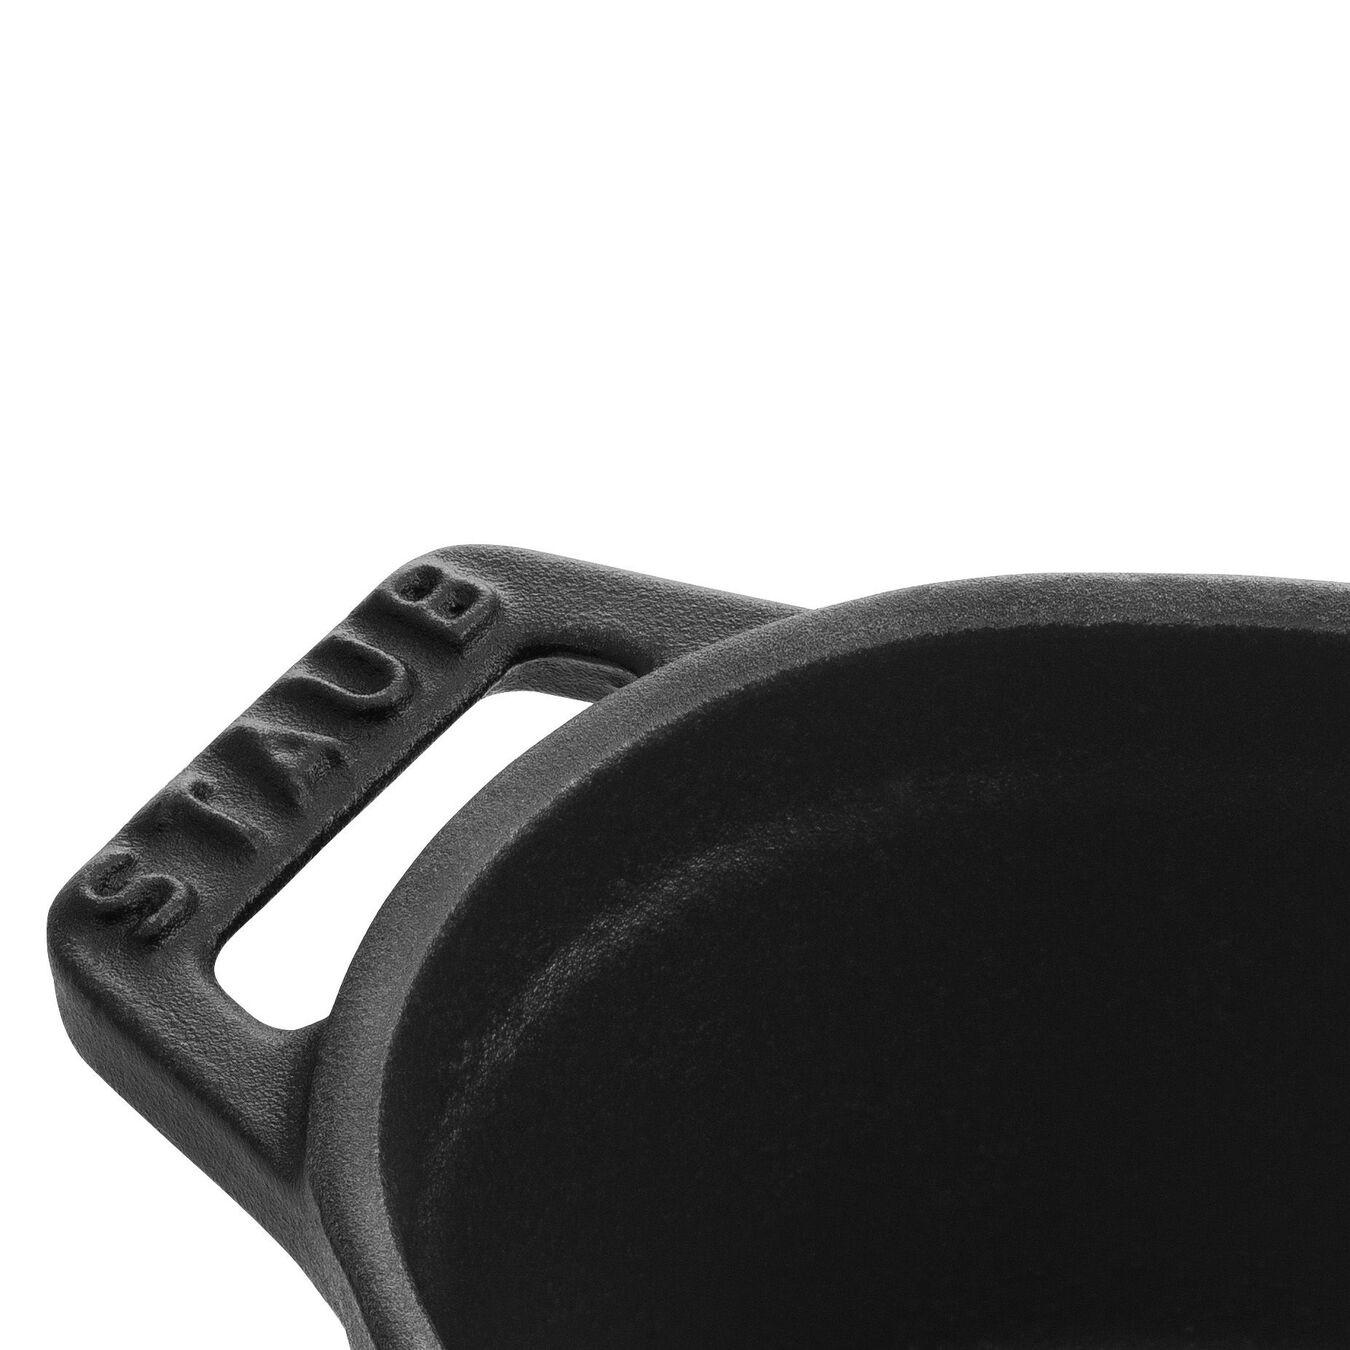 Mini cocotte ovale - 11 cm, nero,,large 4